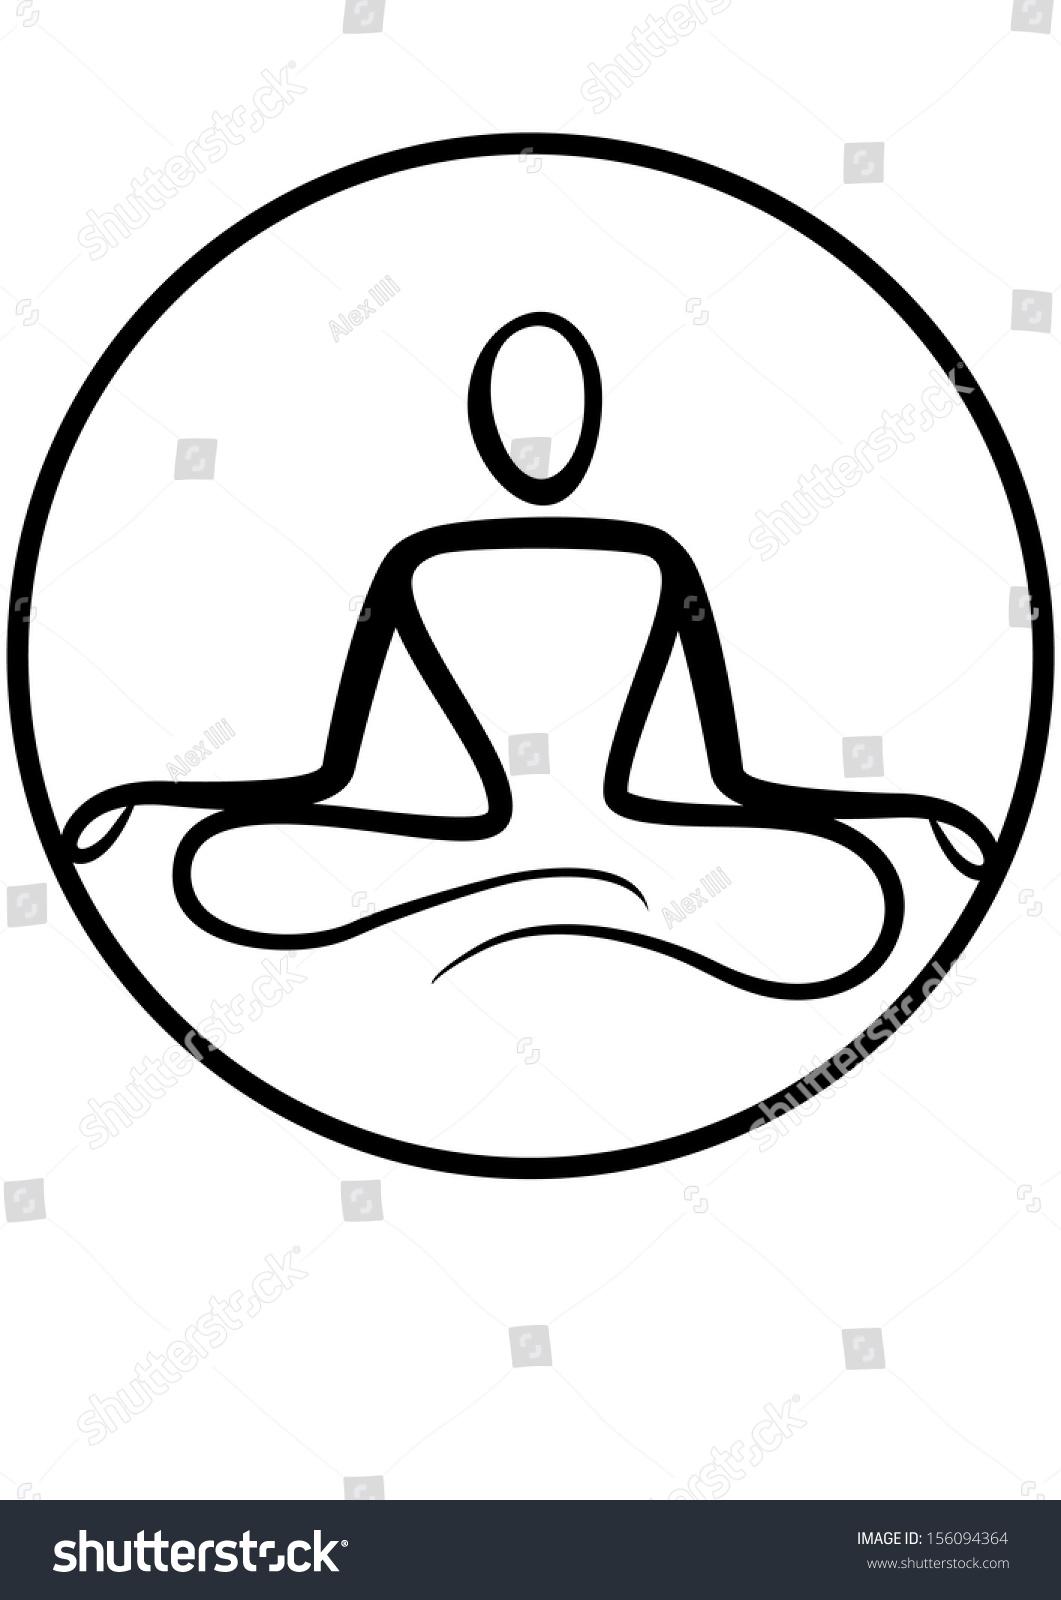 Yoga Symbol Stock Vector 156094364 - Shutterstock